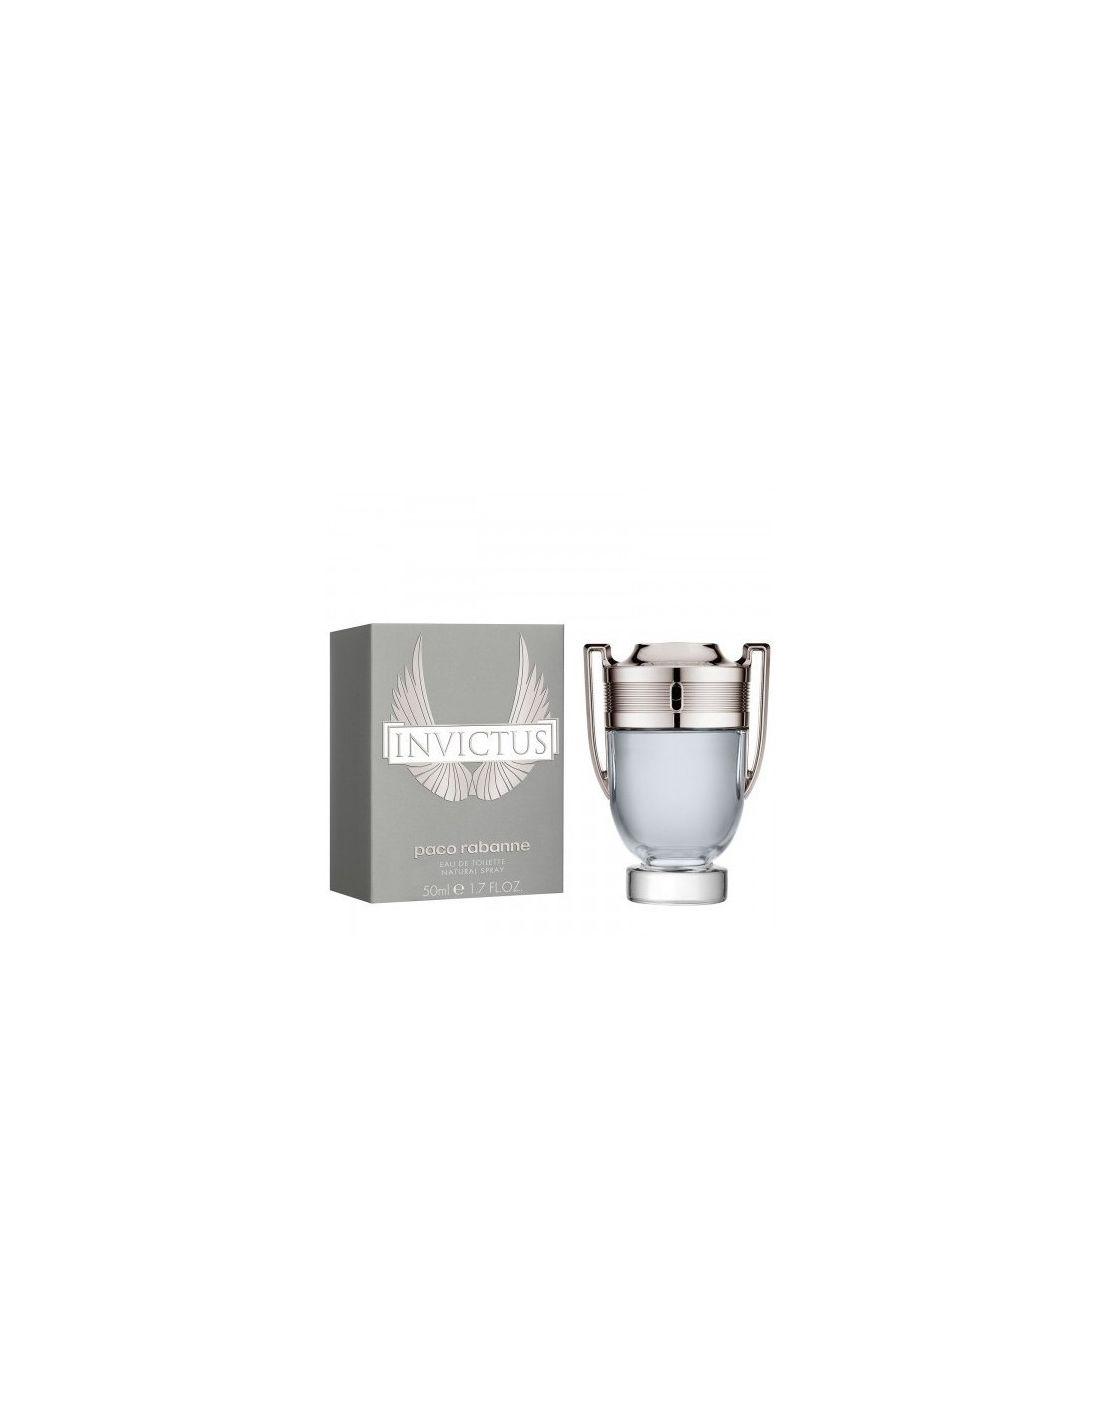 perfume invictus eau de toilette 50 ml perfumes 24